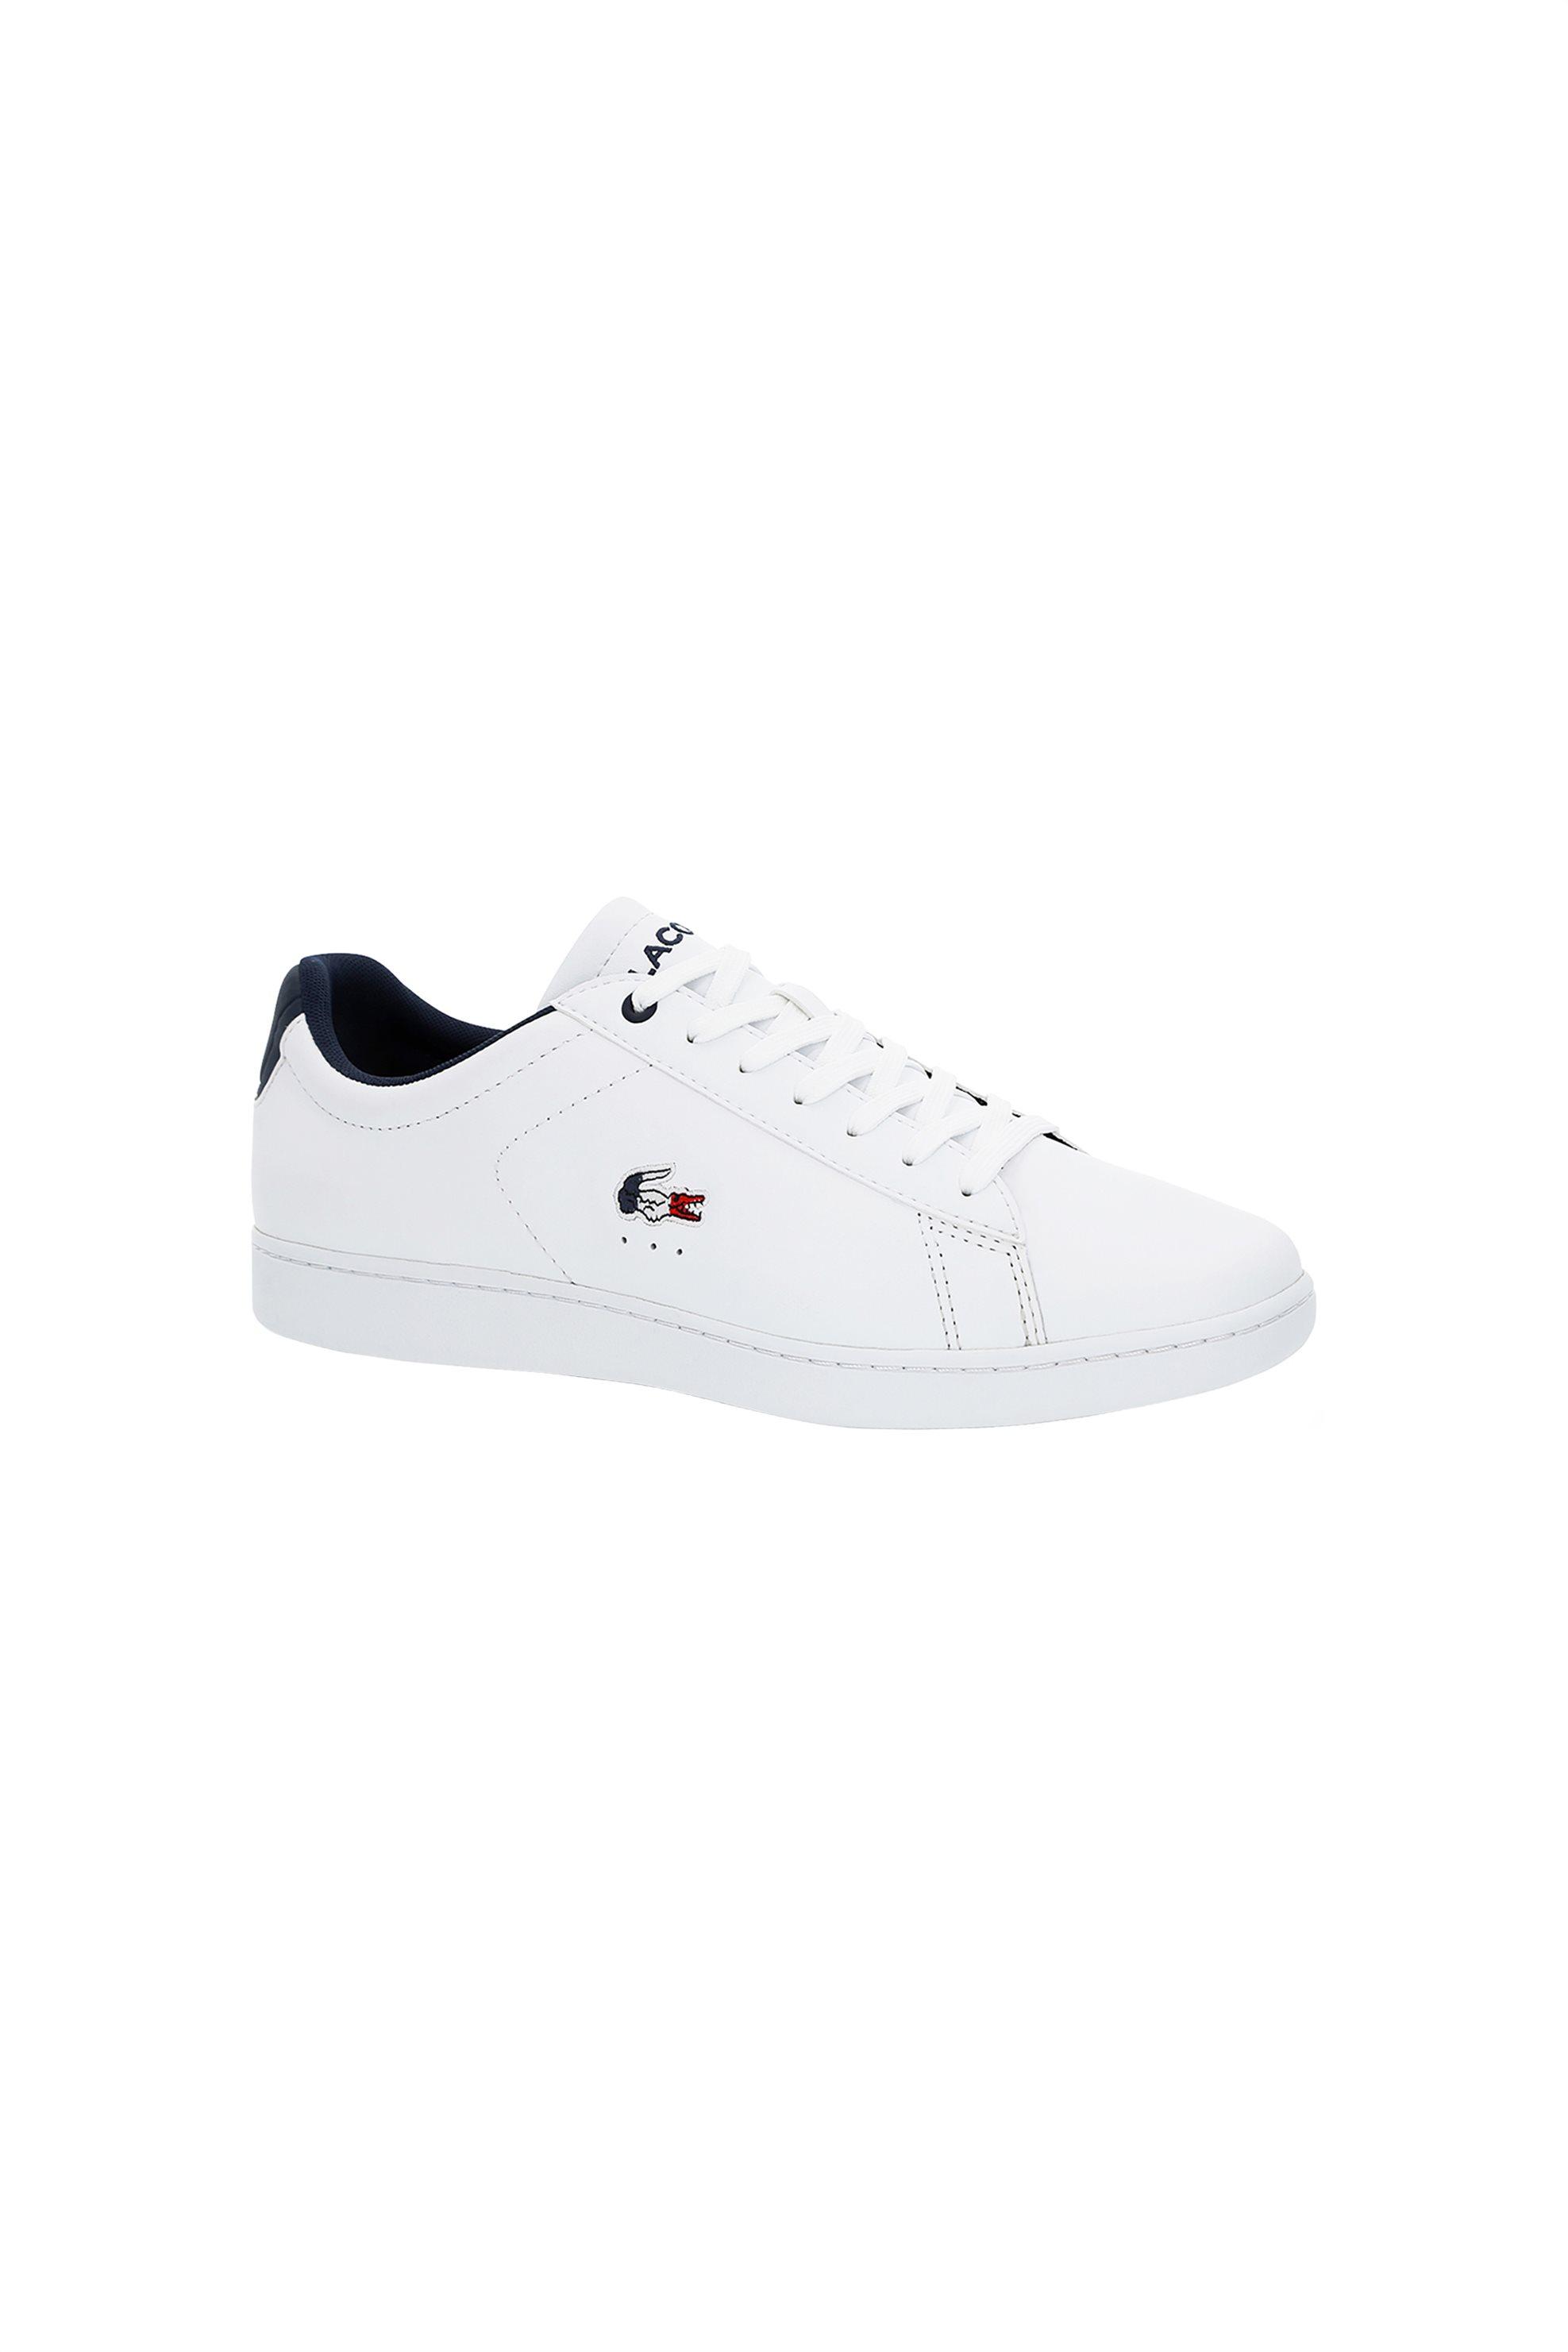 49ac4b92bc85 Notos Lacoste ανδρικά sneakers με κορδόνια Carnaby Evo – 37SMA0013407 –  Λευκό